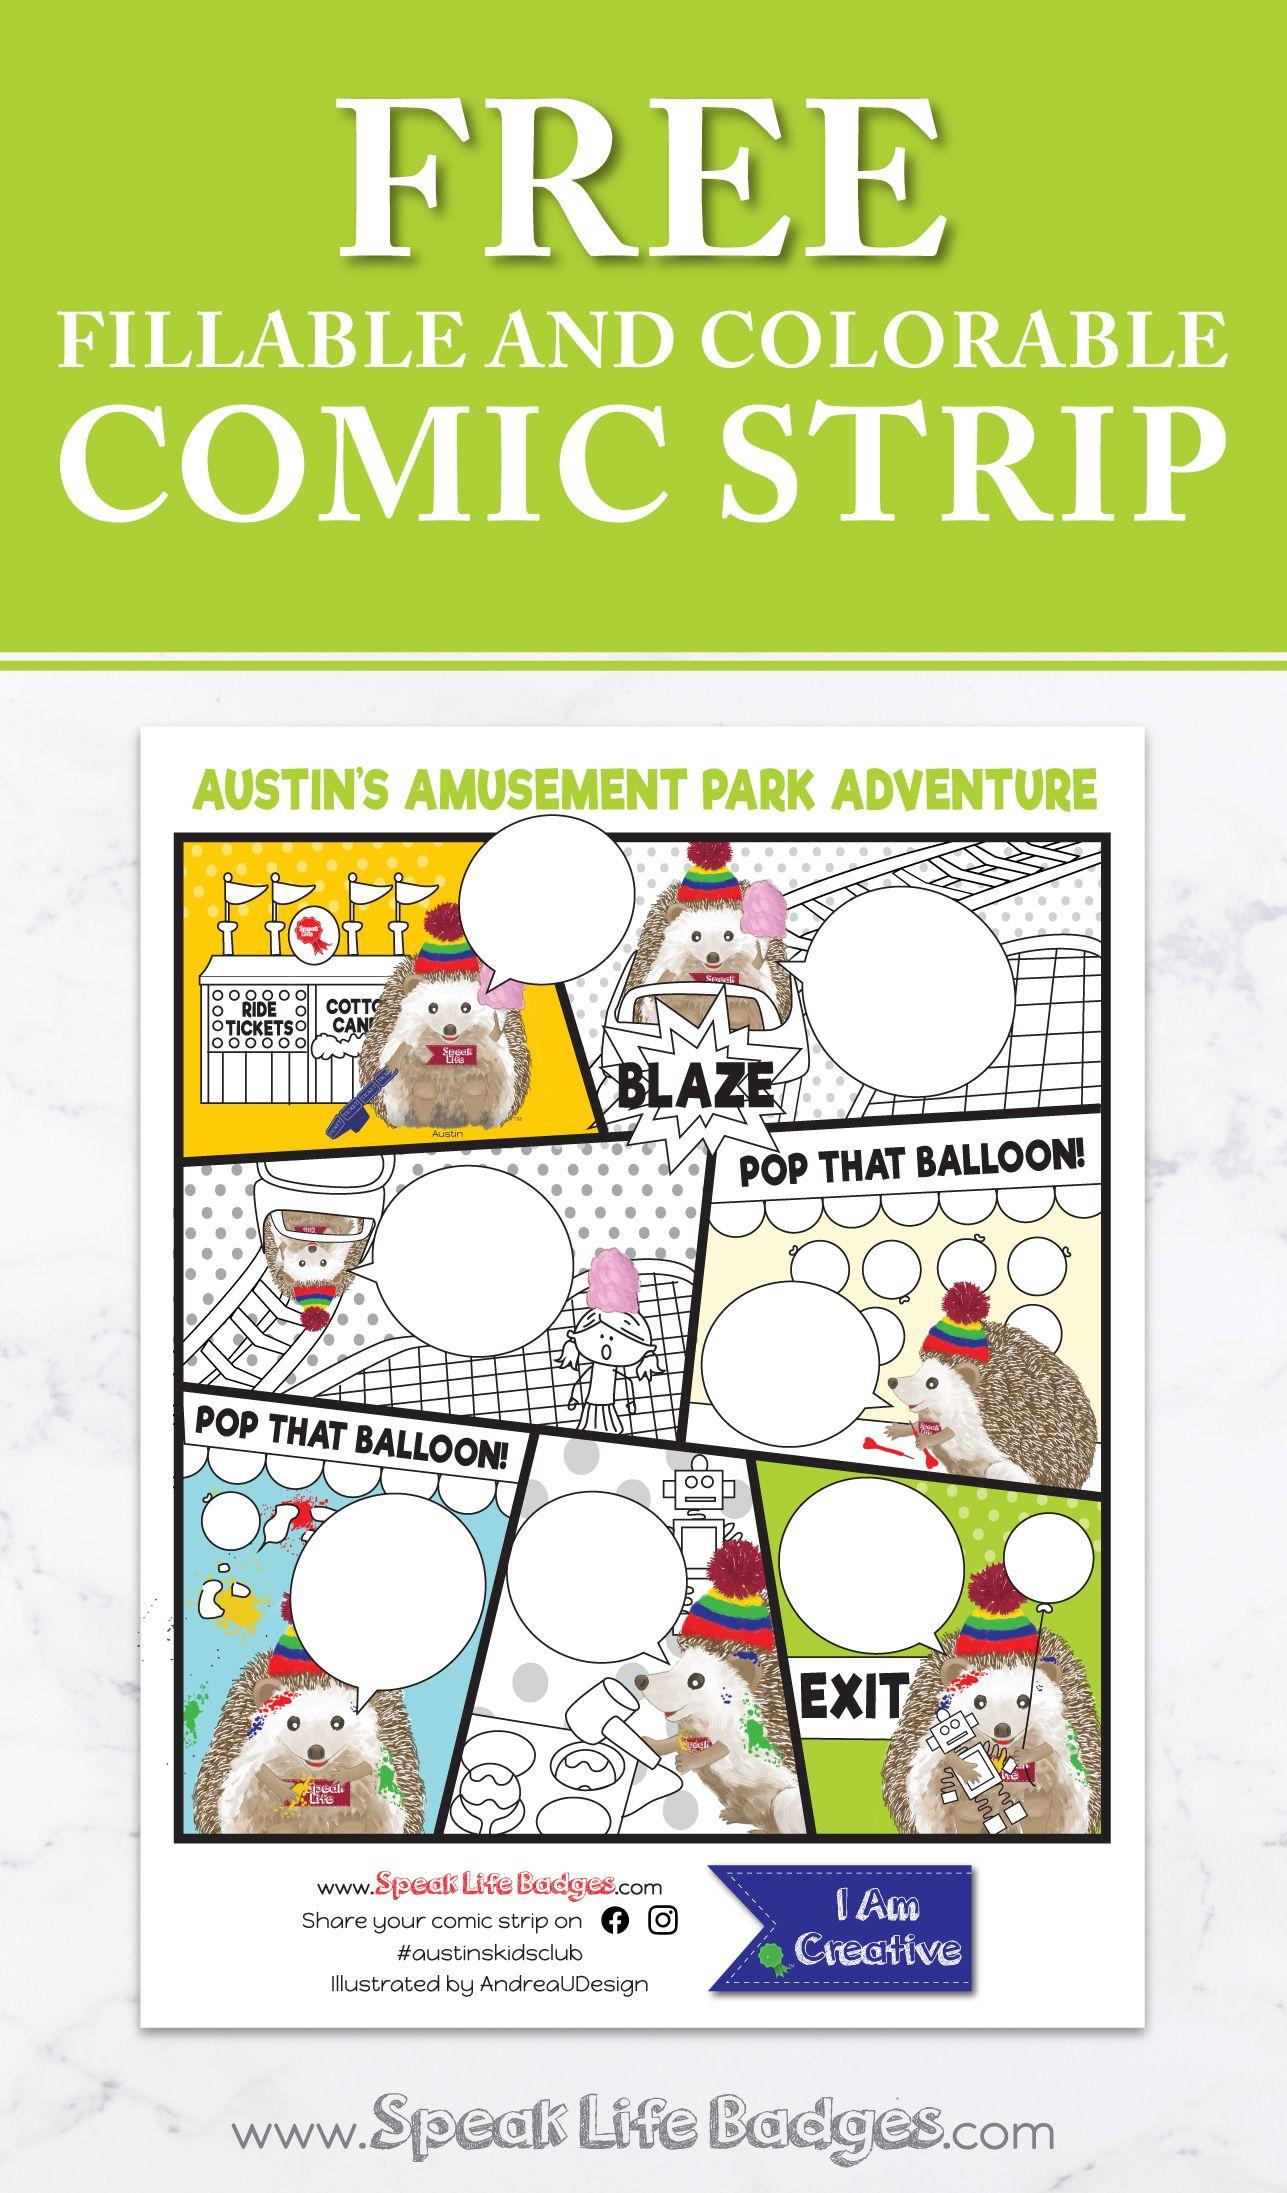 Free Comic Strip From Speak Life Badges In